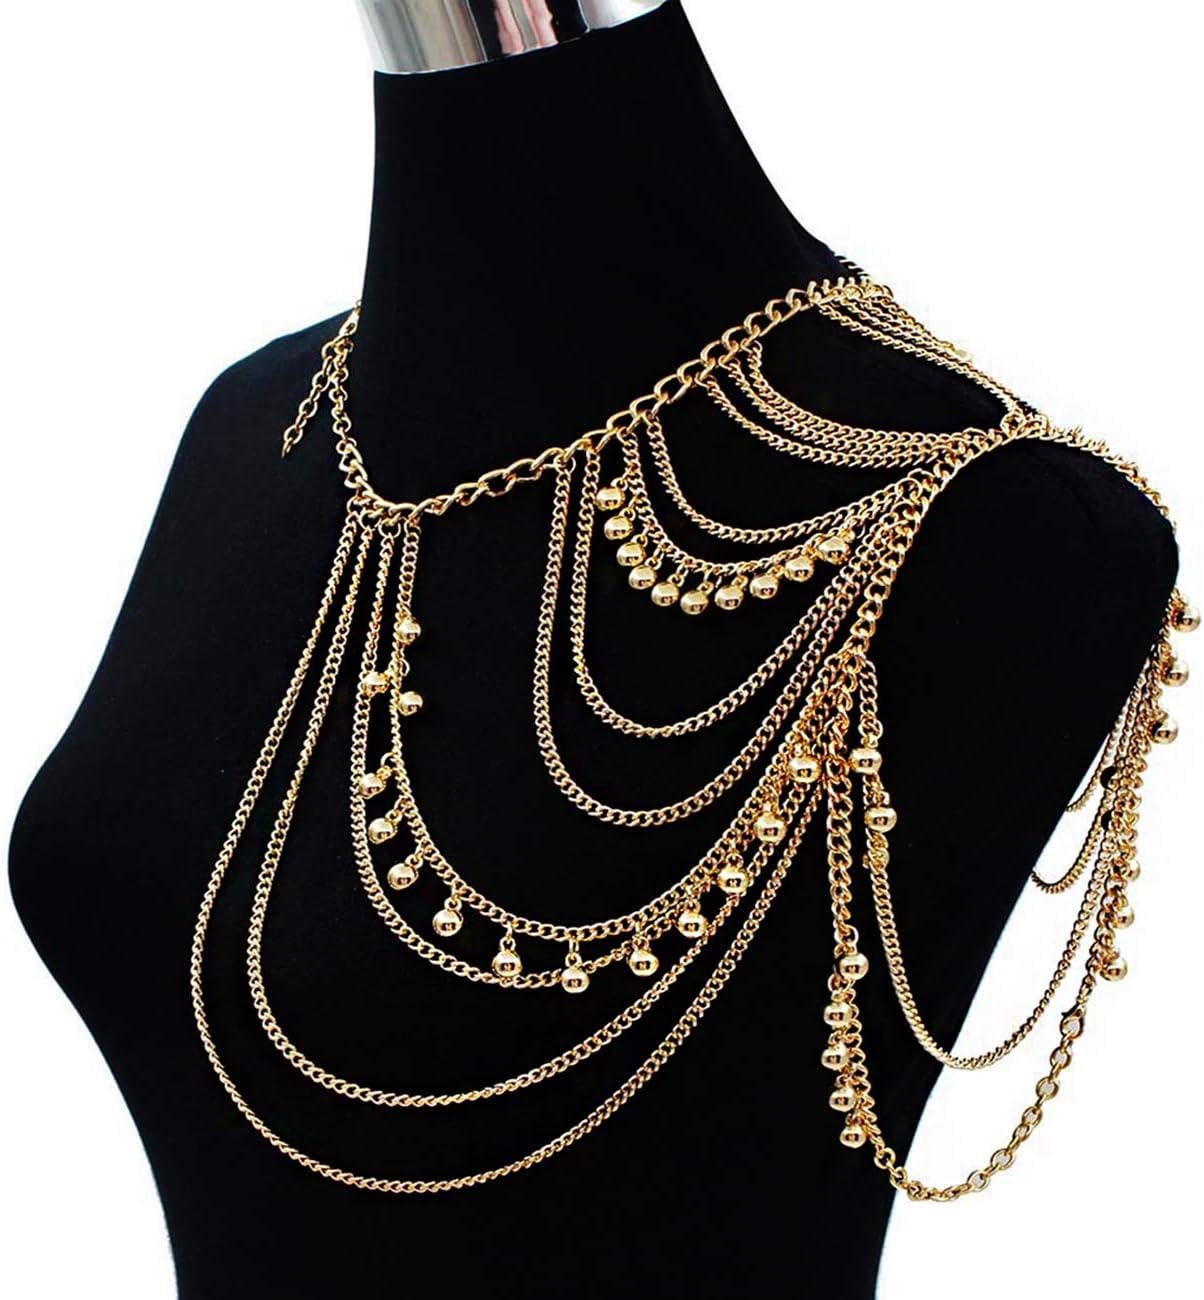 Waist Body Chain Gold Body Jewelry Shoulder Body Chain Festival Shoulder Necklace Fashion Body Chain, Body Jewelry Chain Set